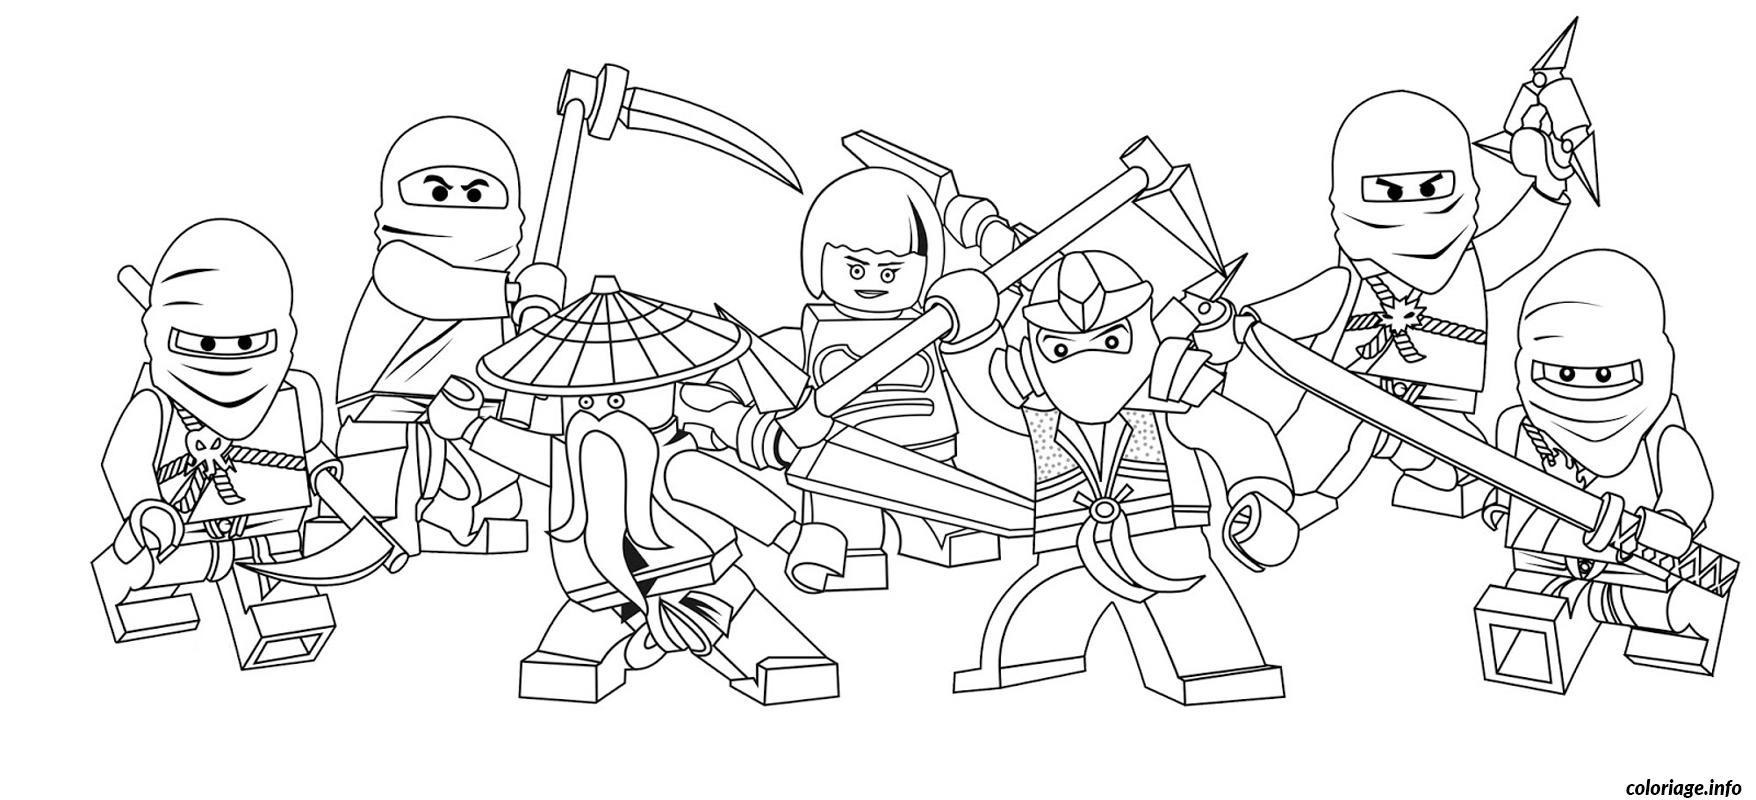 Coloriage ninjago equipe complete lego dessin dessin - Ninjago a imprimer ...